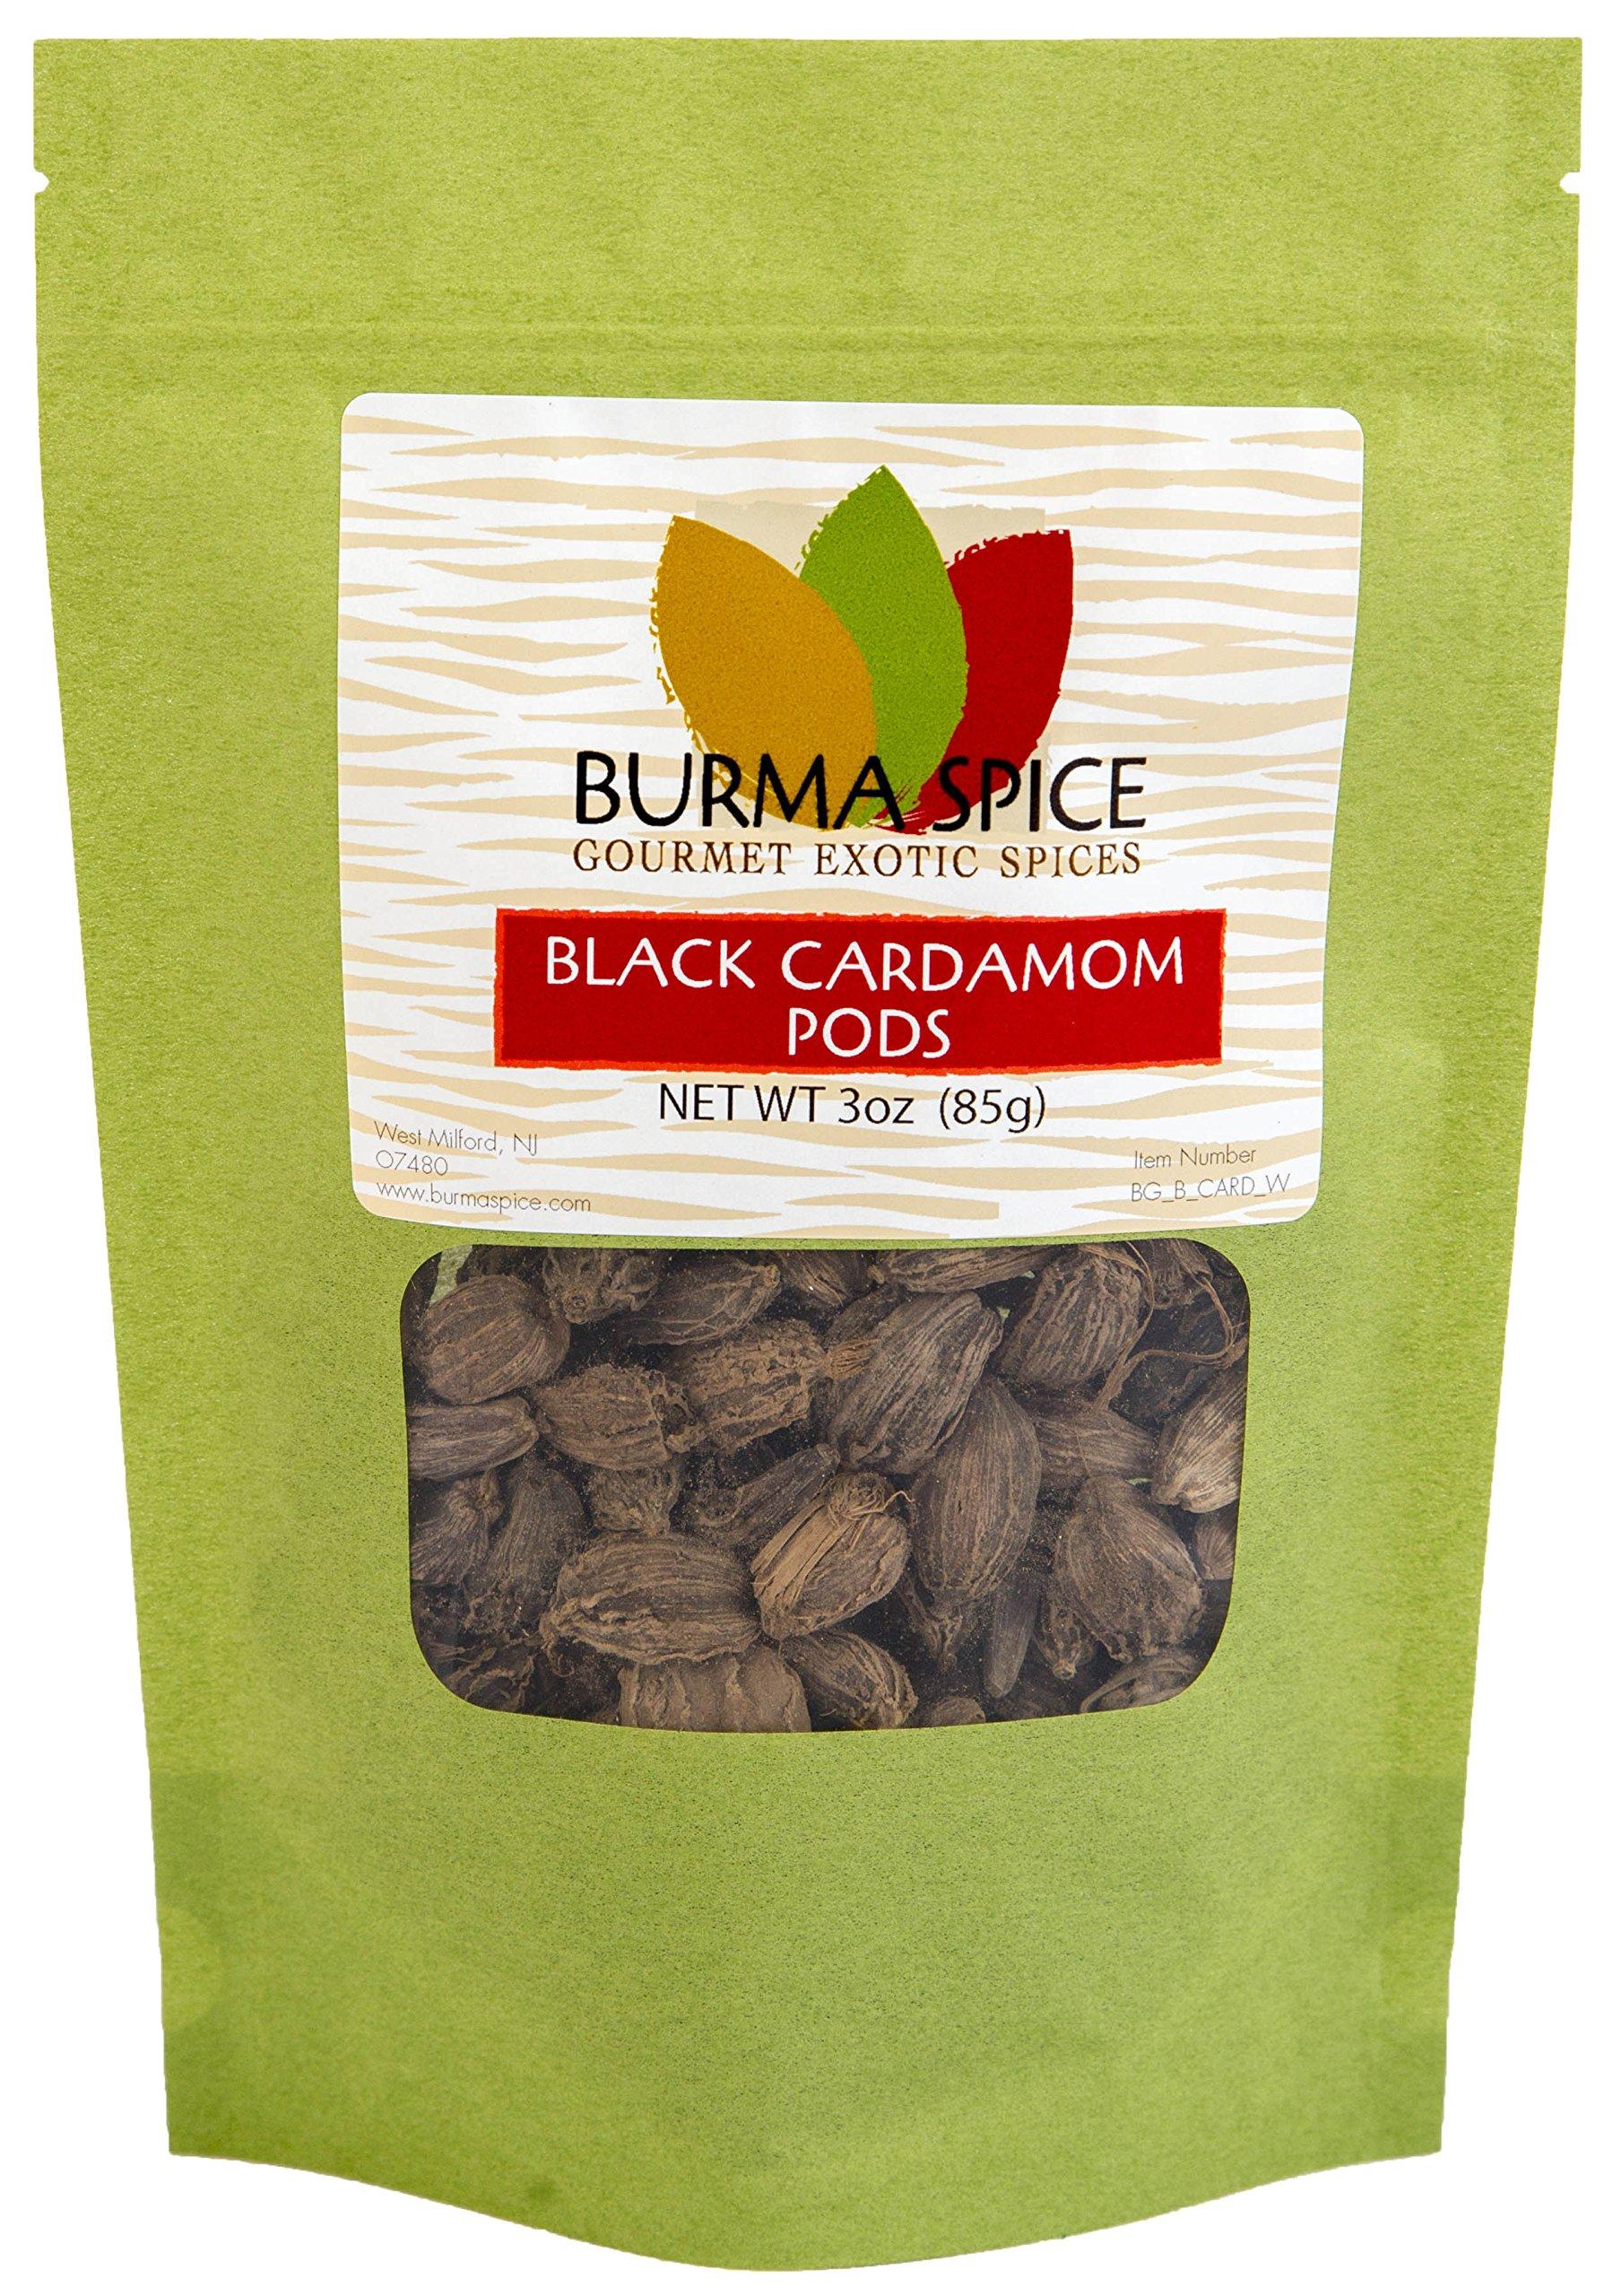 Black Cardamom Pods Bag, 3oz, also avail in 5oz see sizes